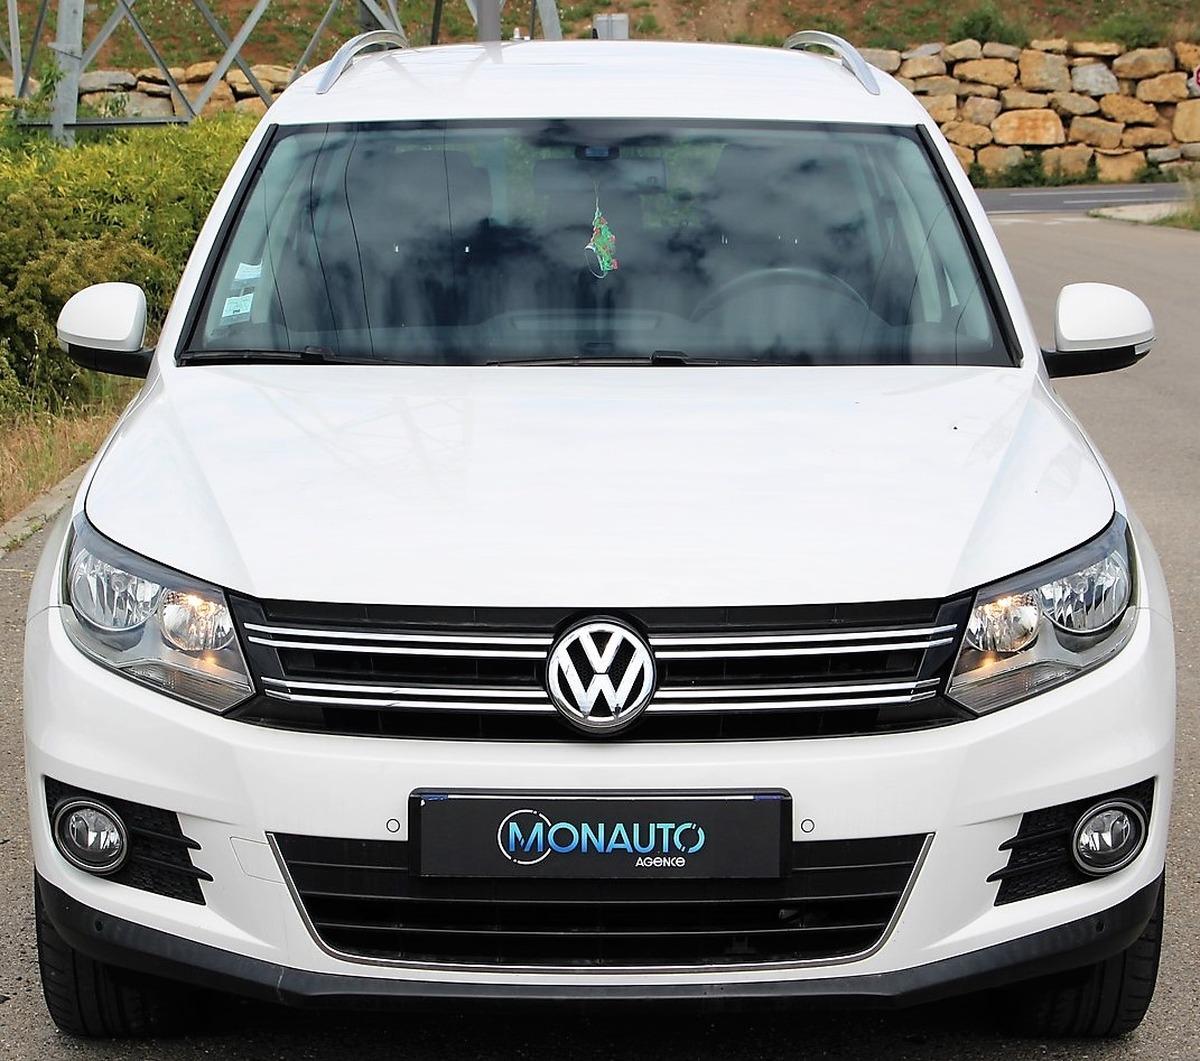 Volkswagen Tiguan 2.0 TDI SPORTLINE 140 ch